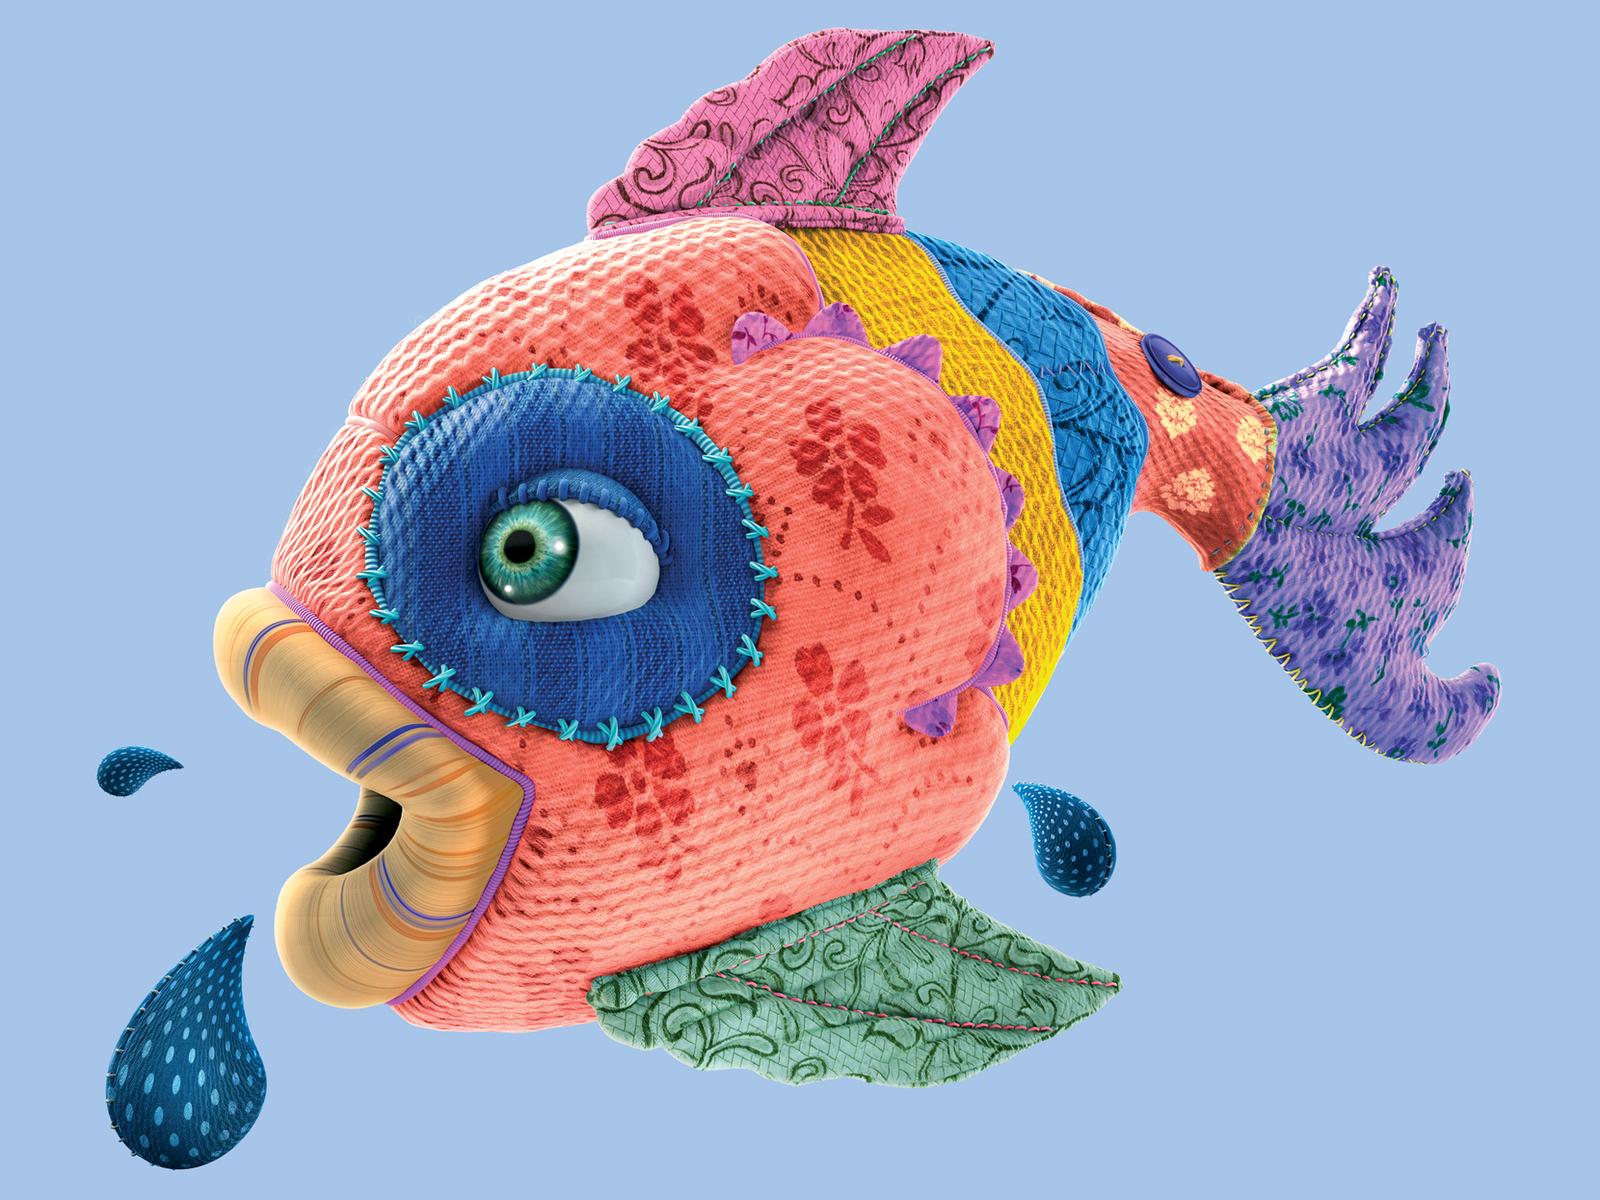 3d fish from fabrics hd wallpaper | download hd wallpapers